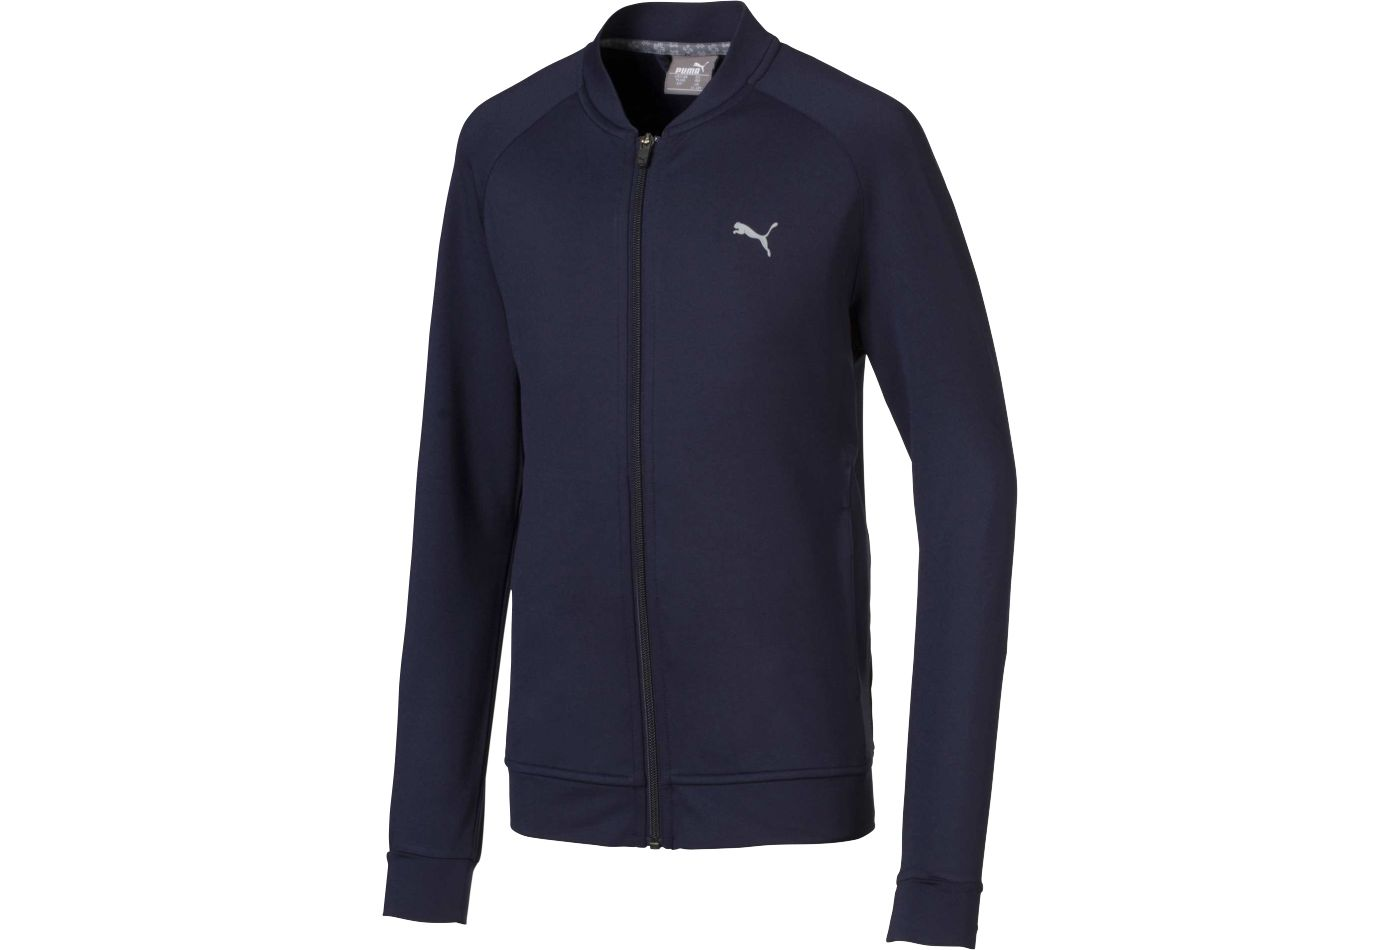 PUMA Boys' Full Zip Golf Jacket